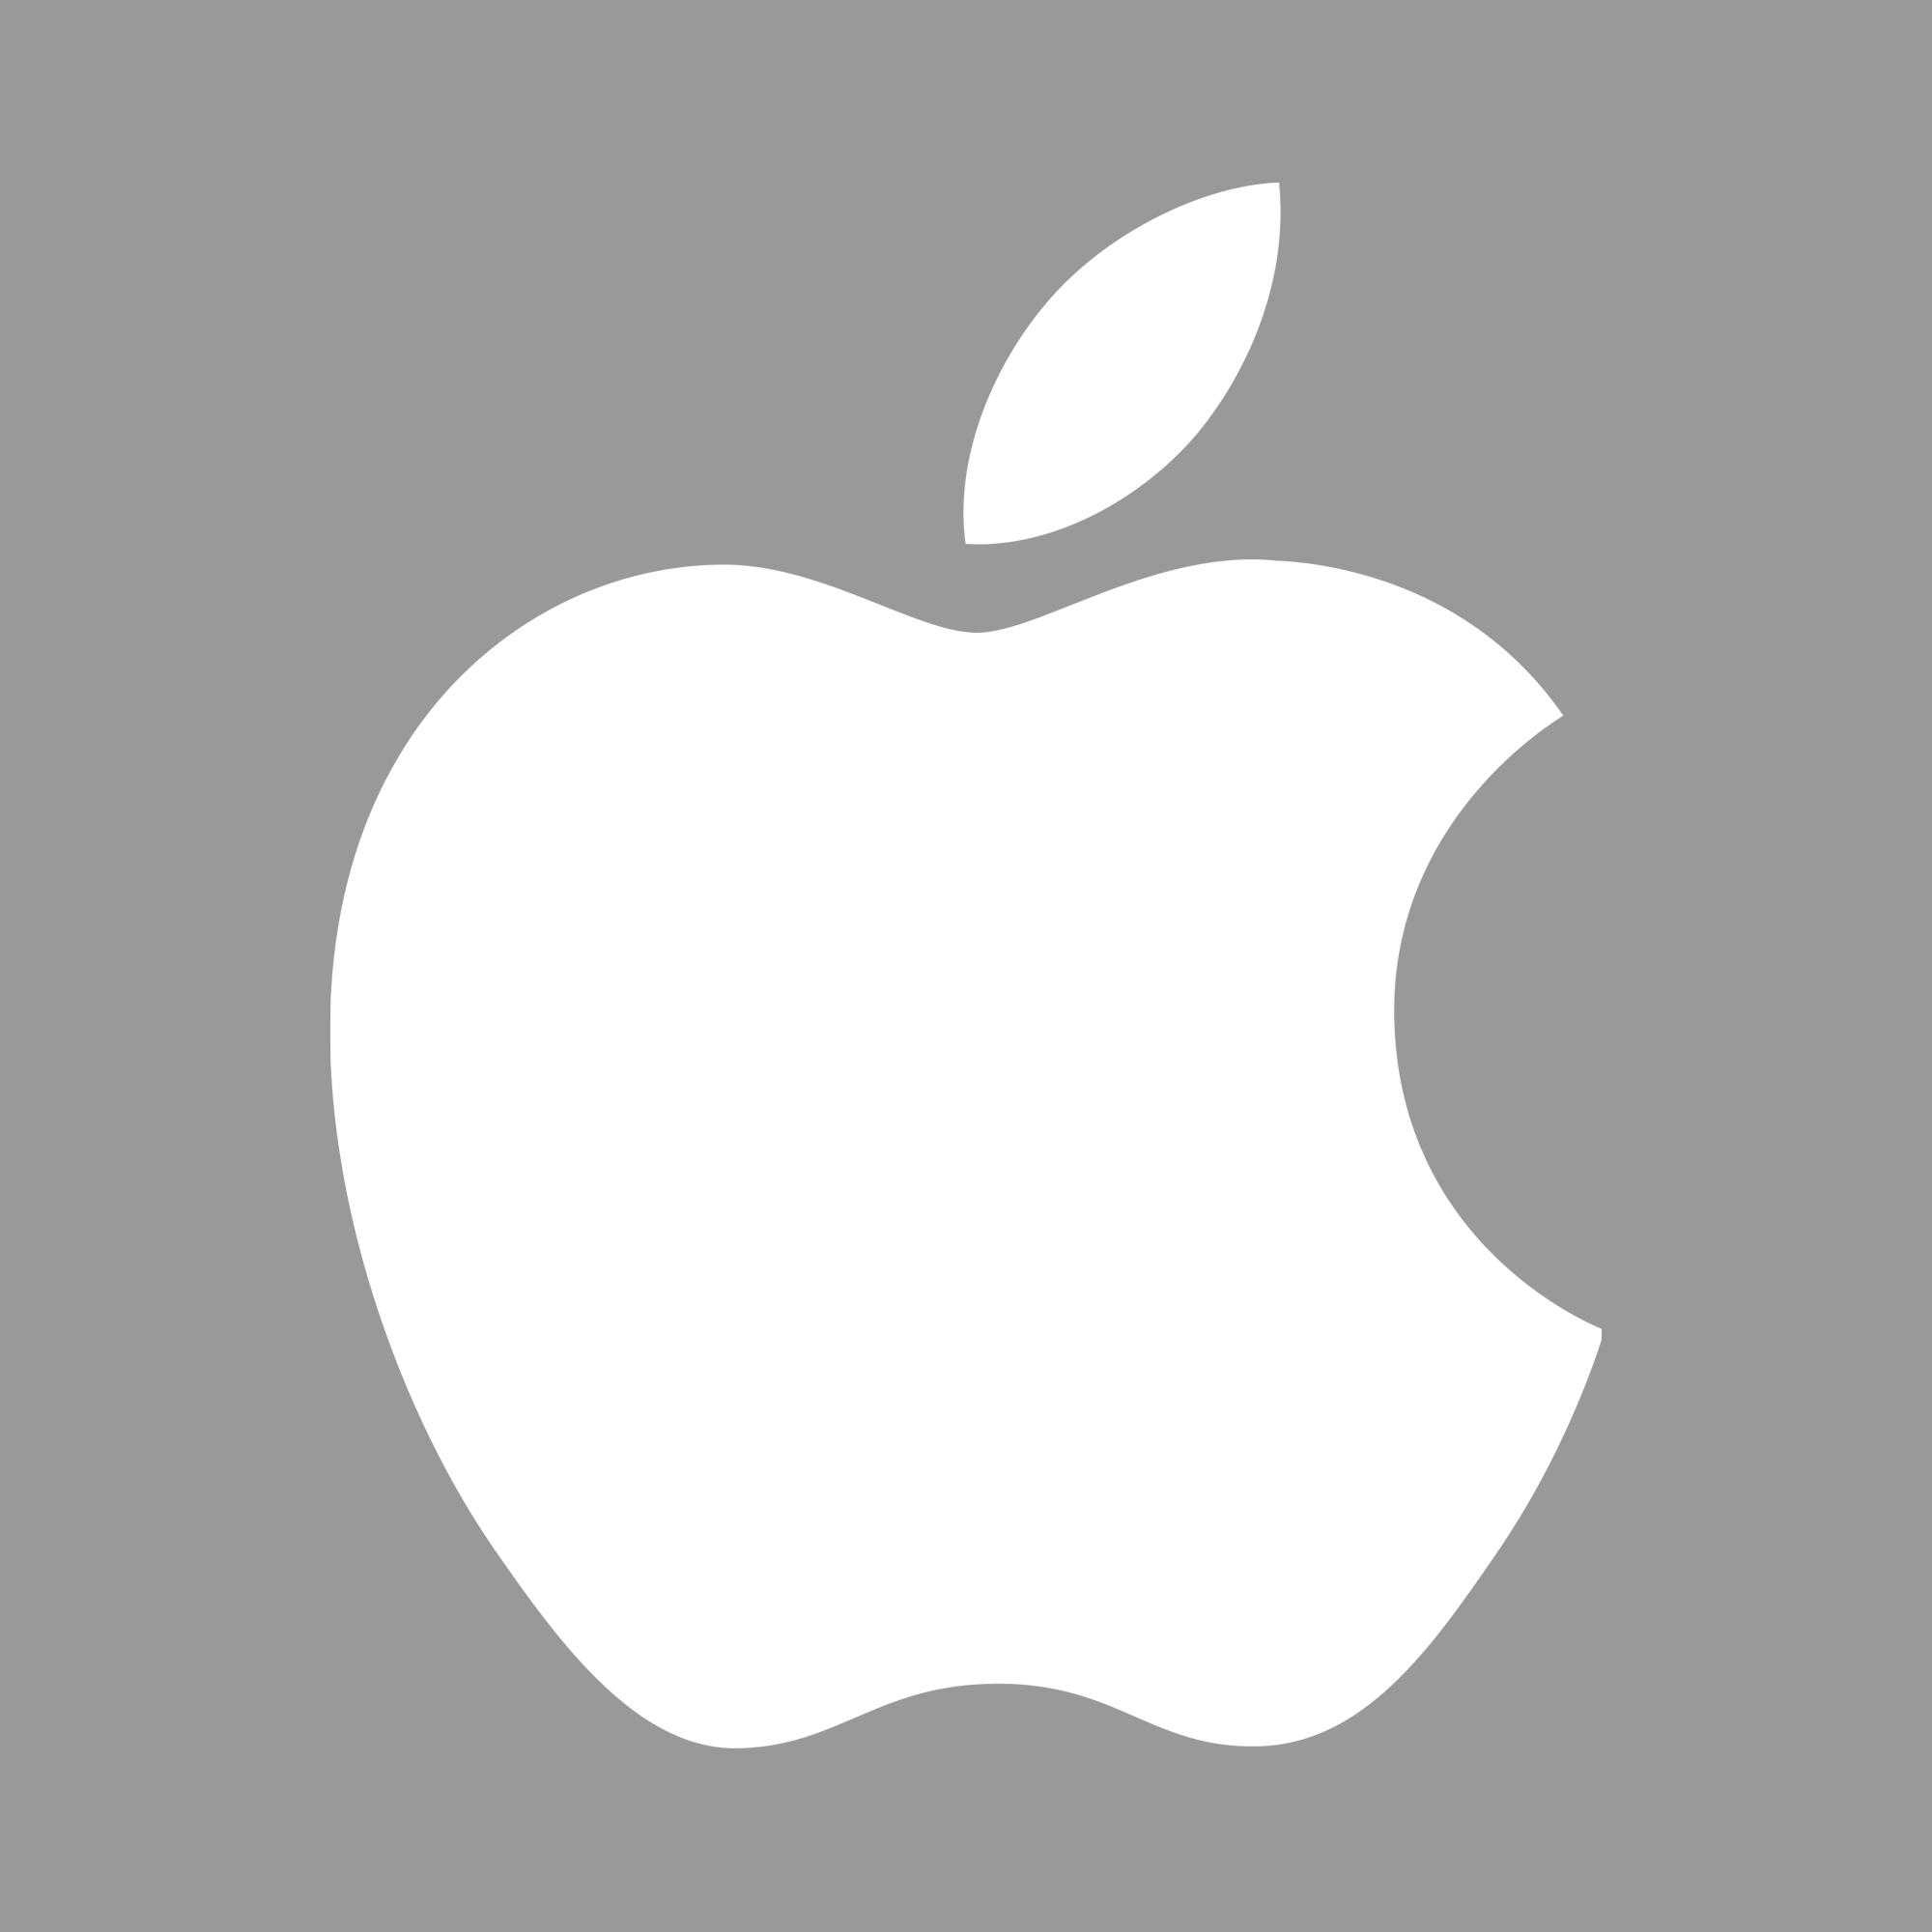 Apple en grande forme se prépare au coronavirus